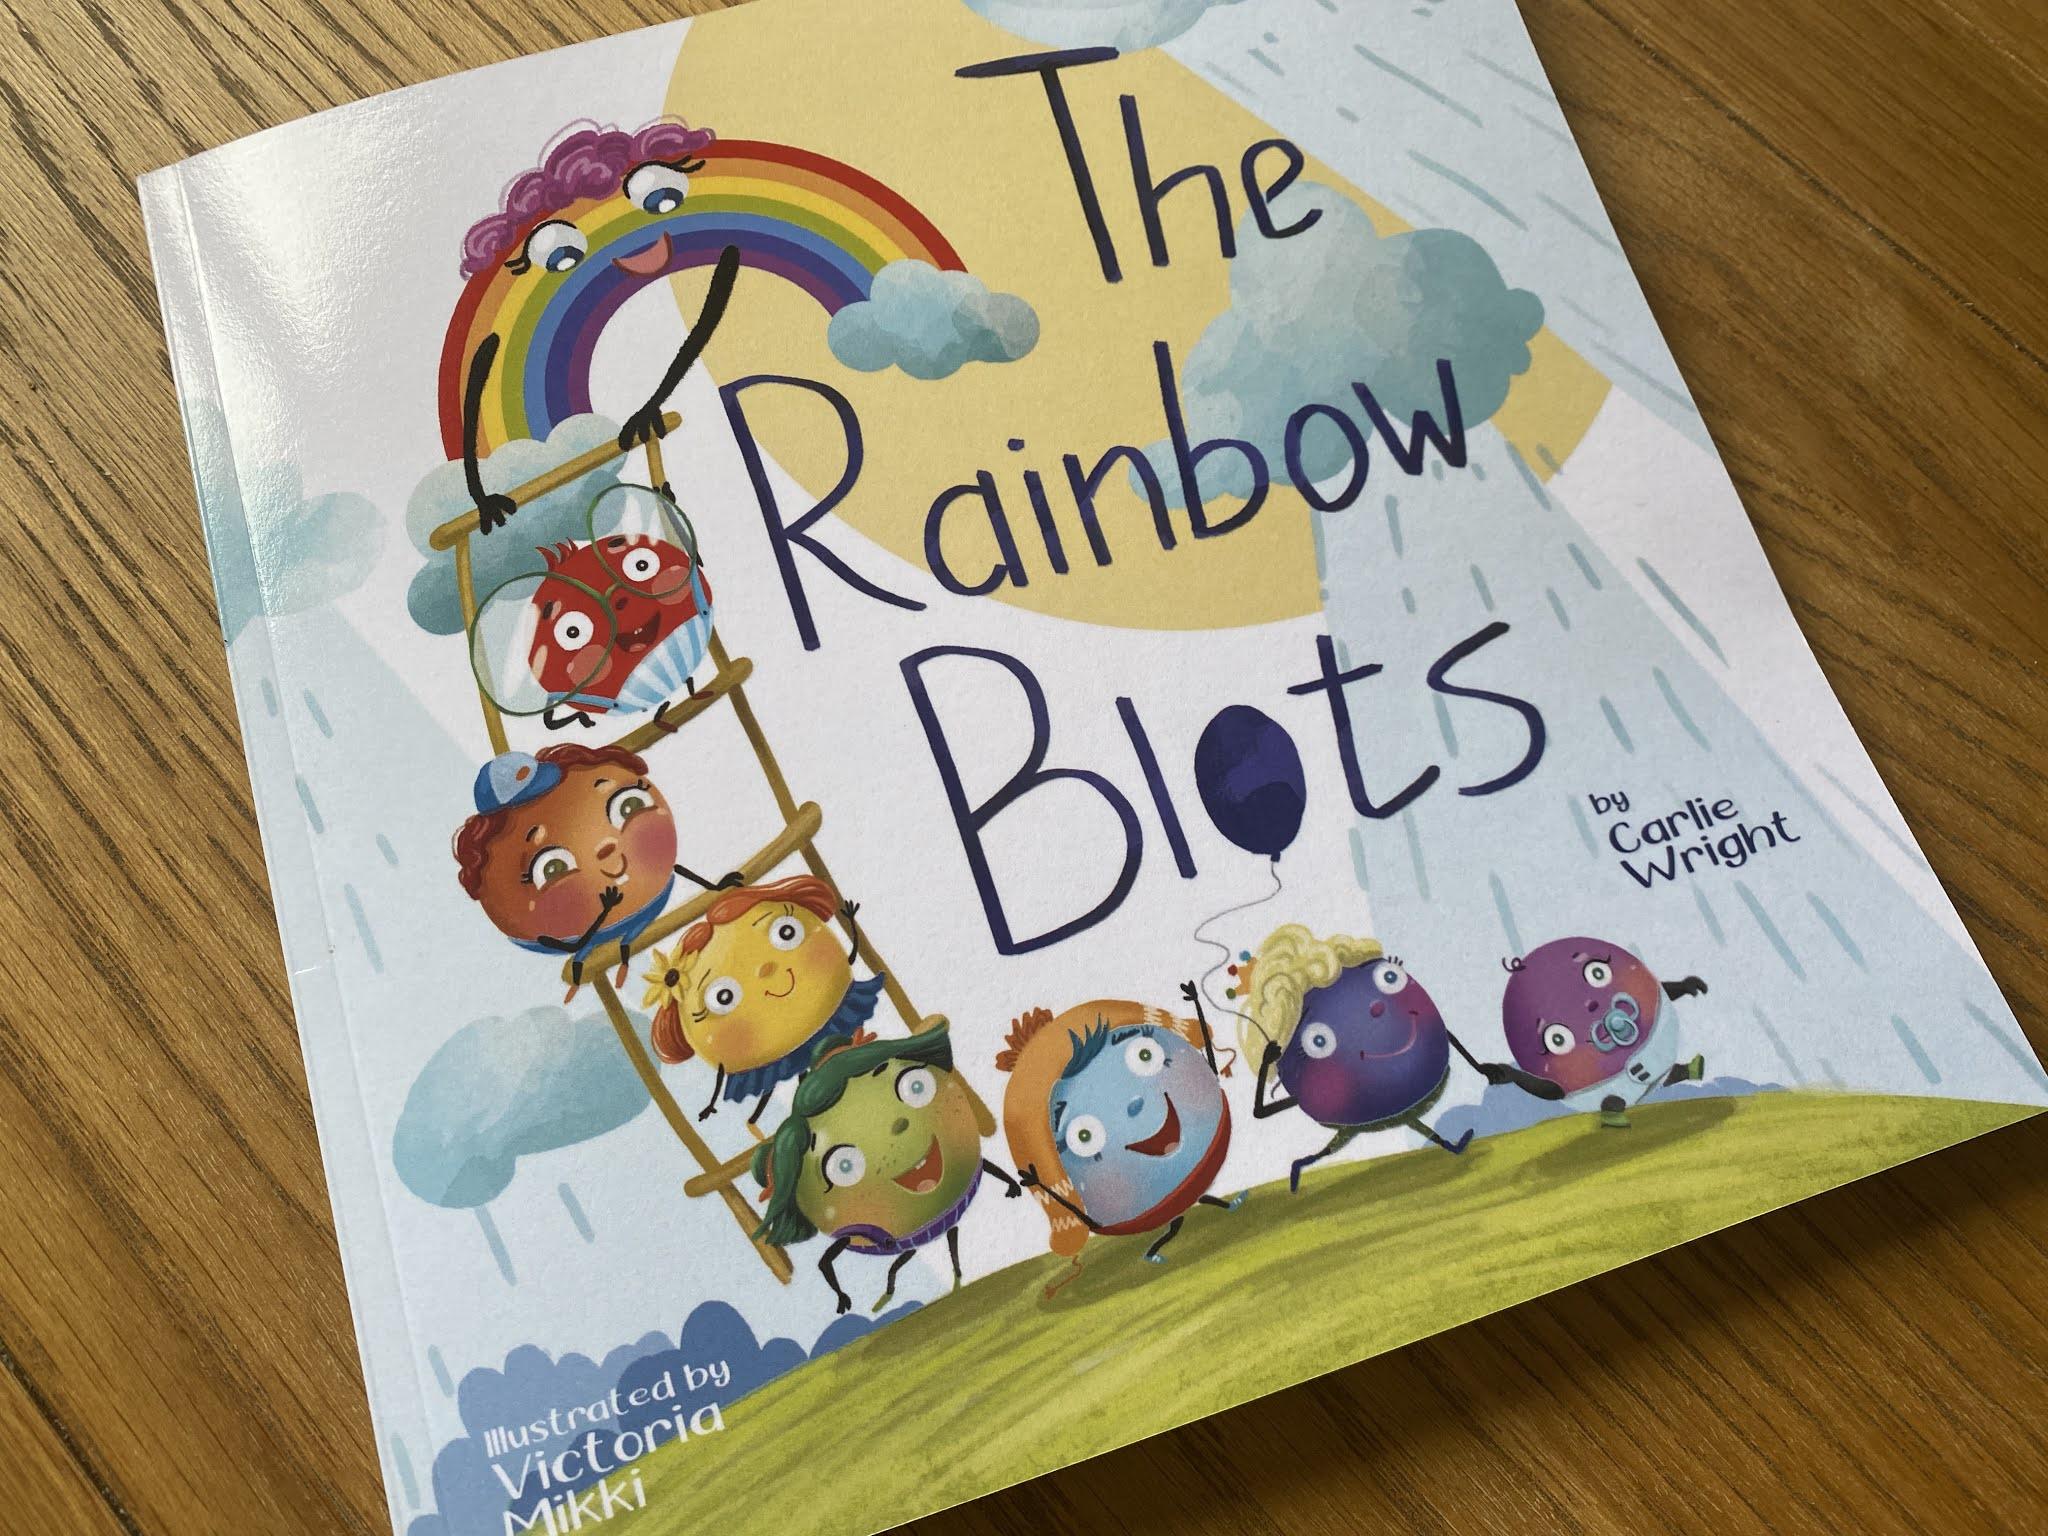 The rainbow Blots